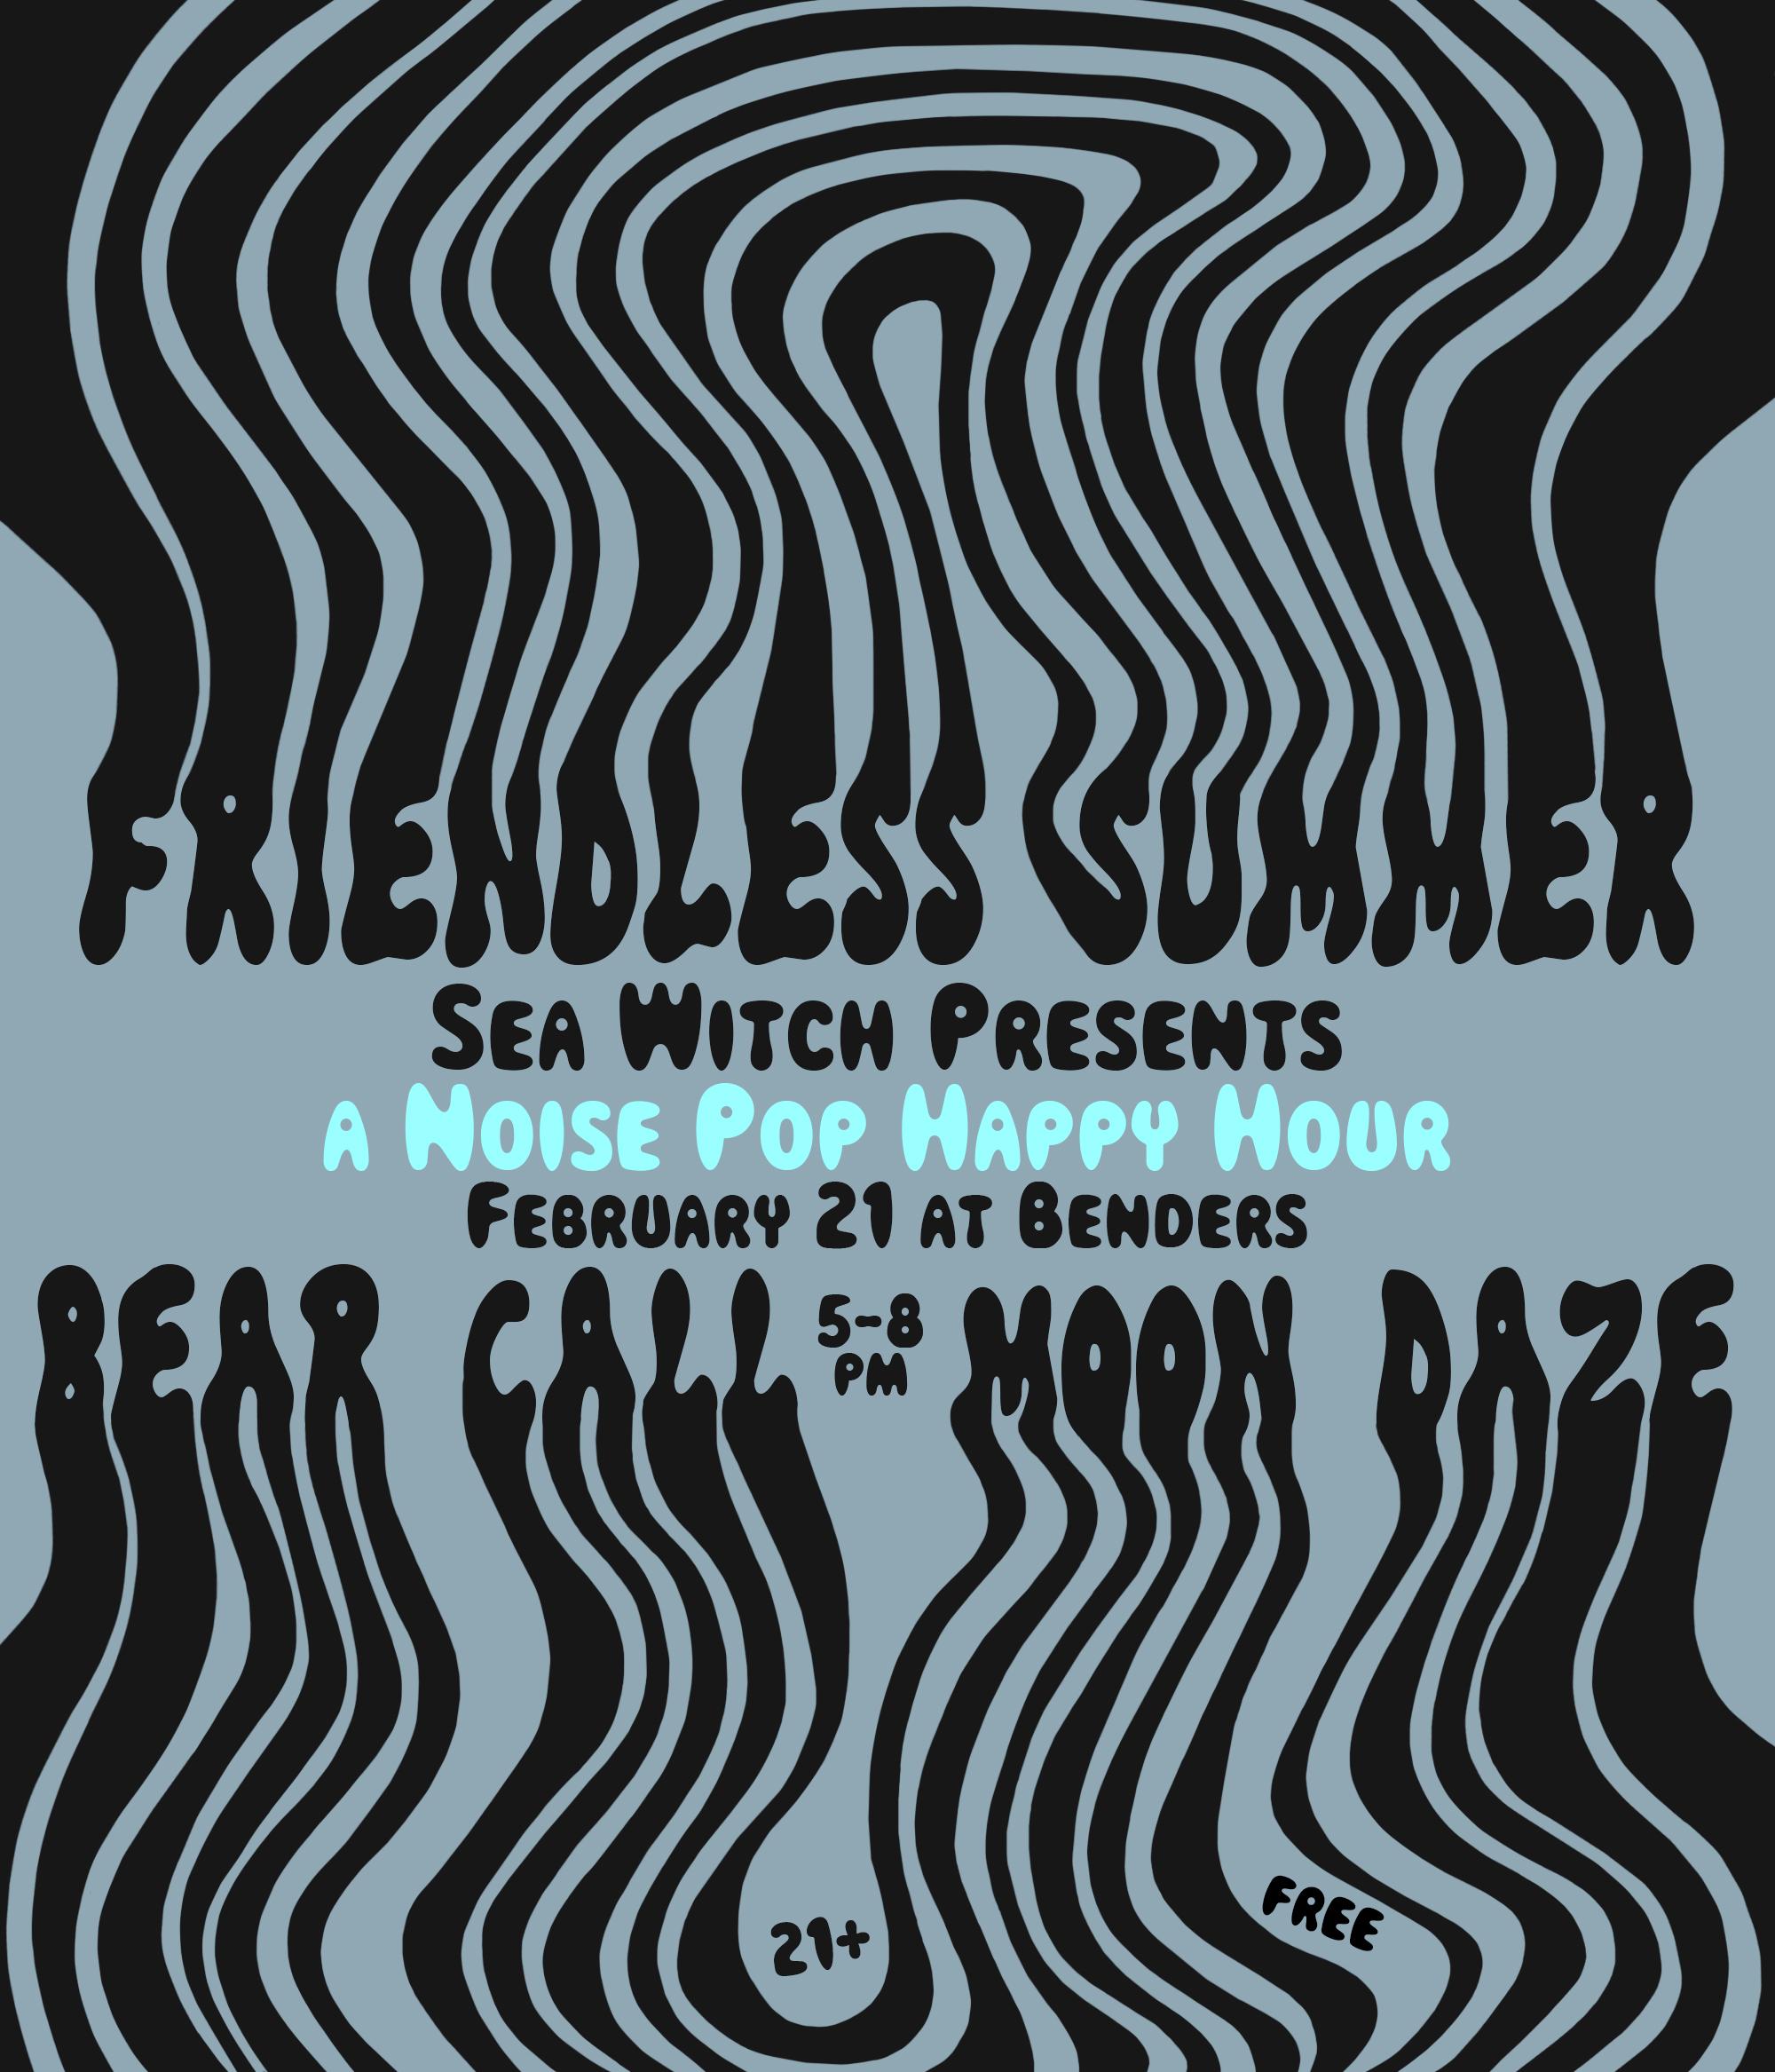 free af - Friendless SummerBear CallMoon Daze21+ / RSVP HEREMore info at:http://www.noisepop.com/